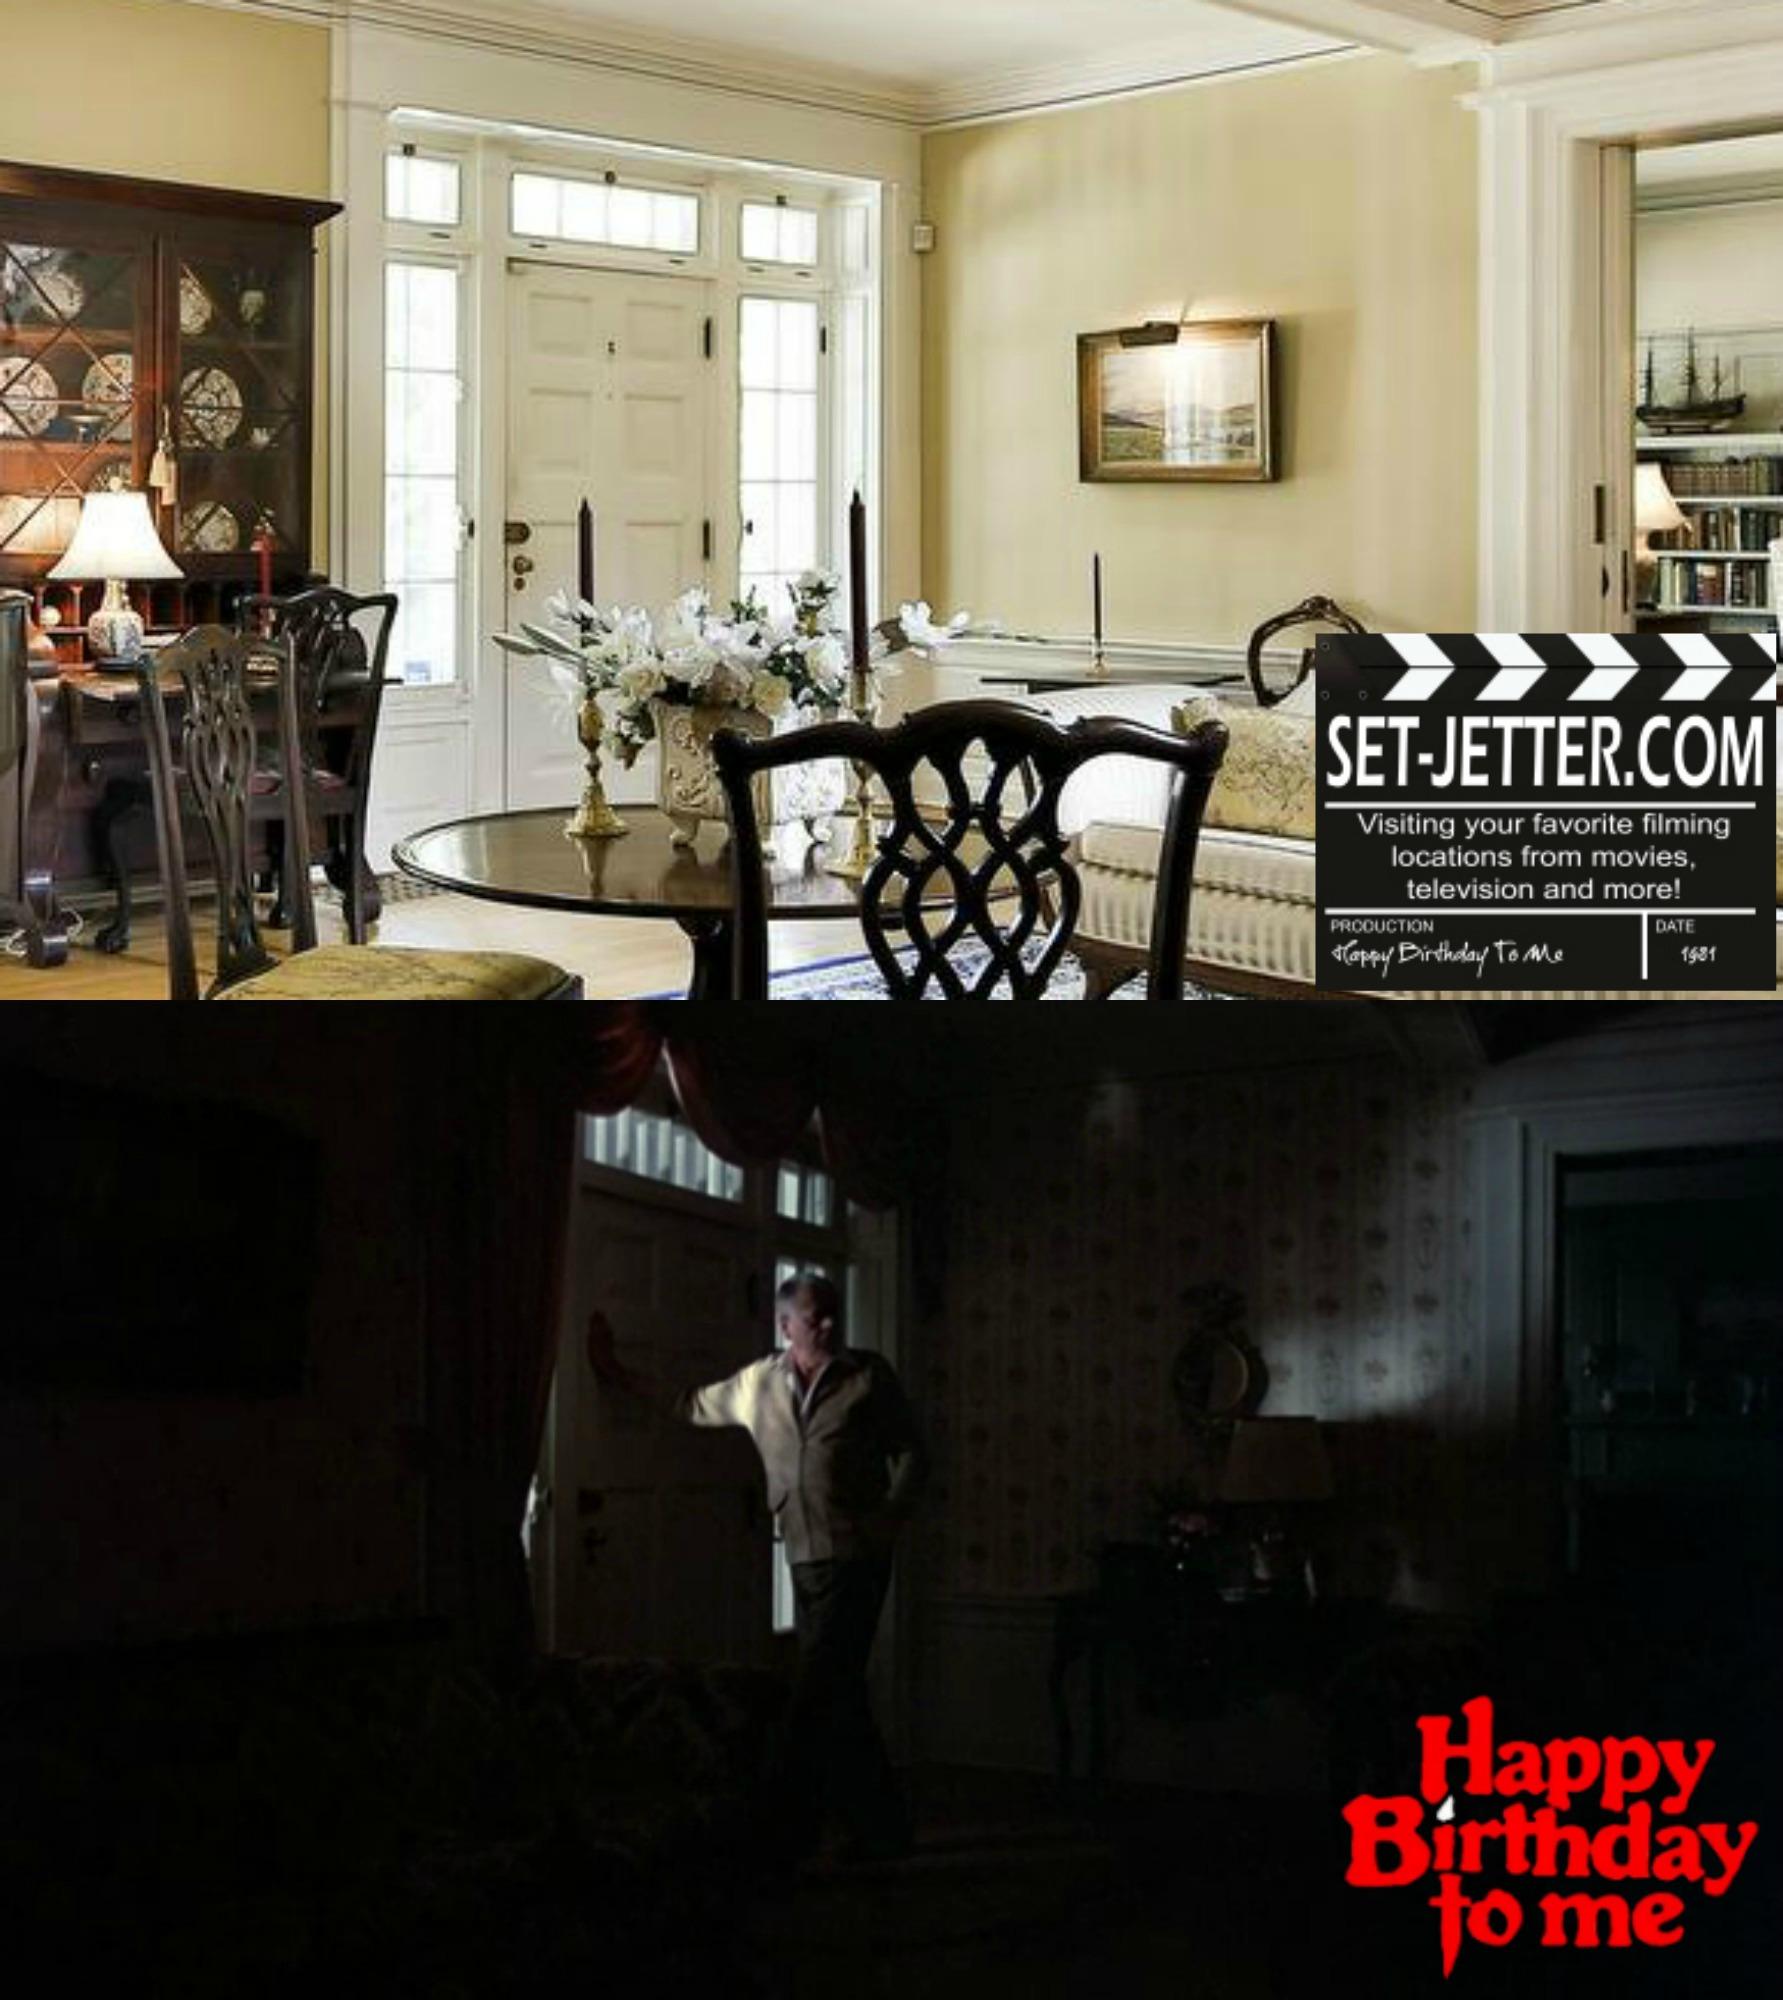 Happy Birthday To Me comparison 117.jpg